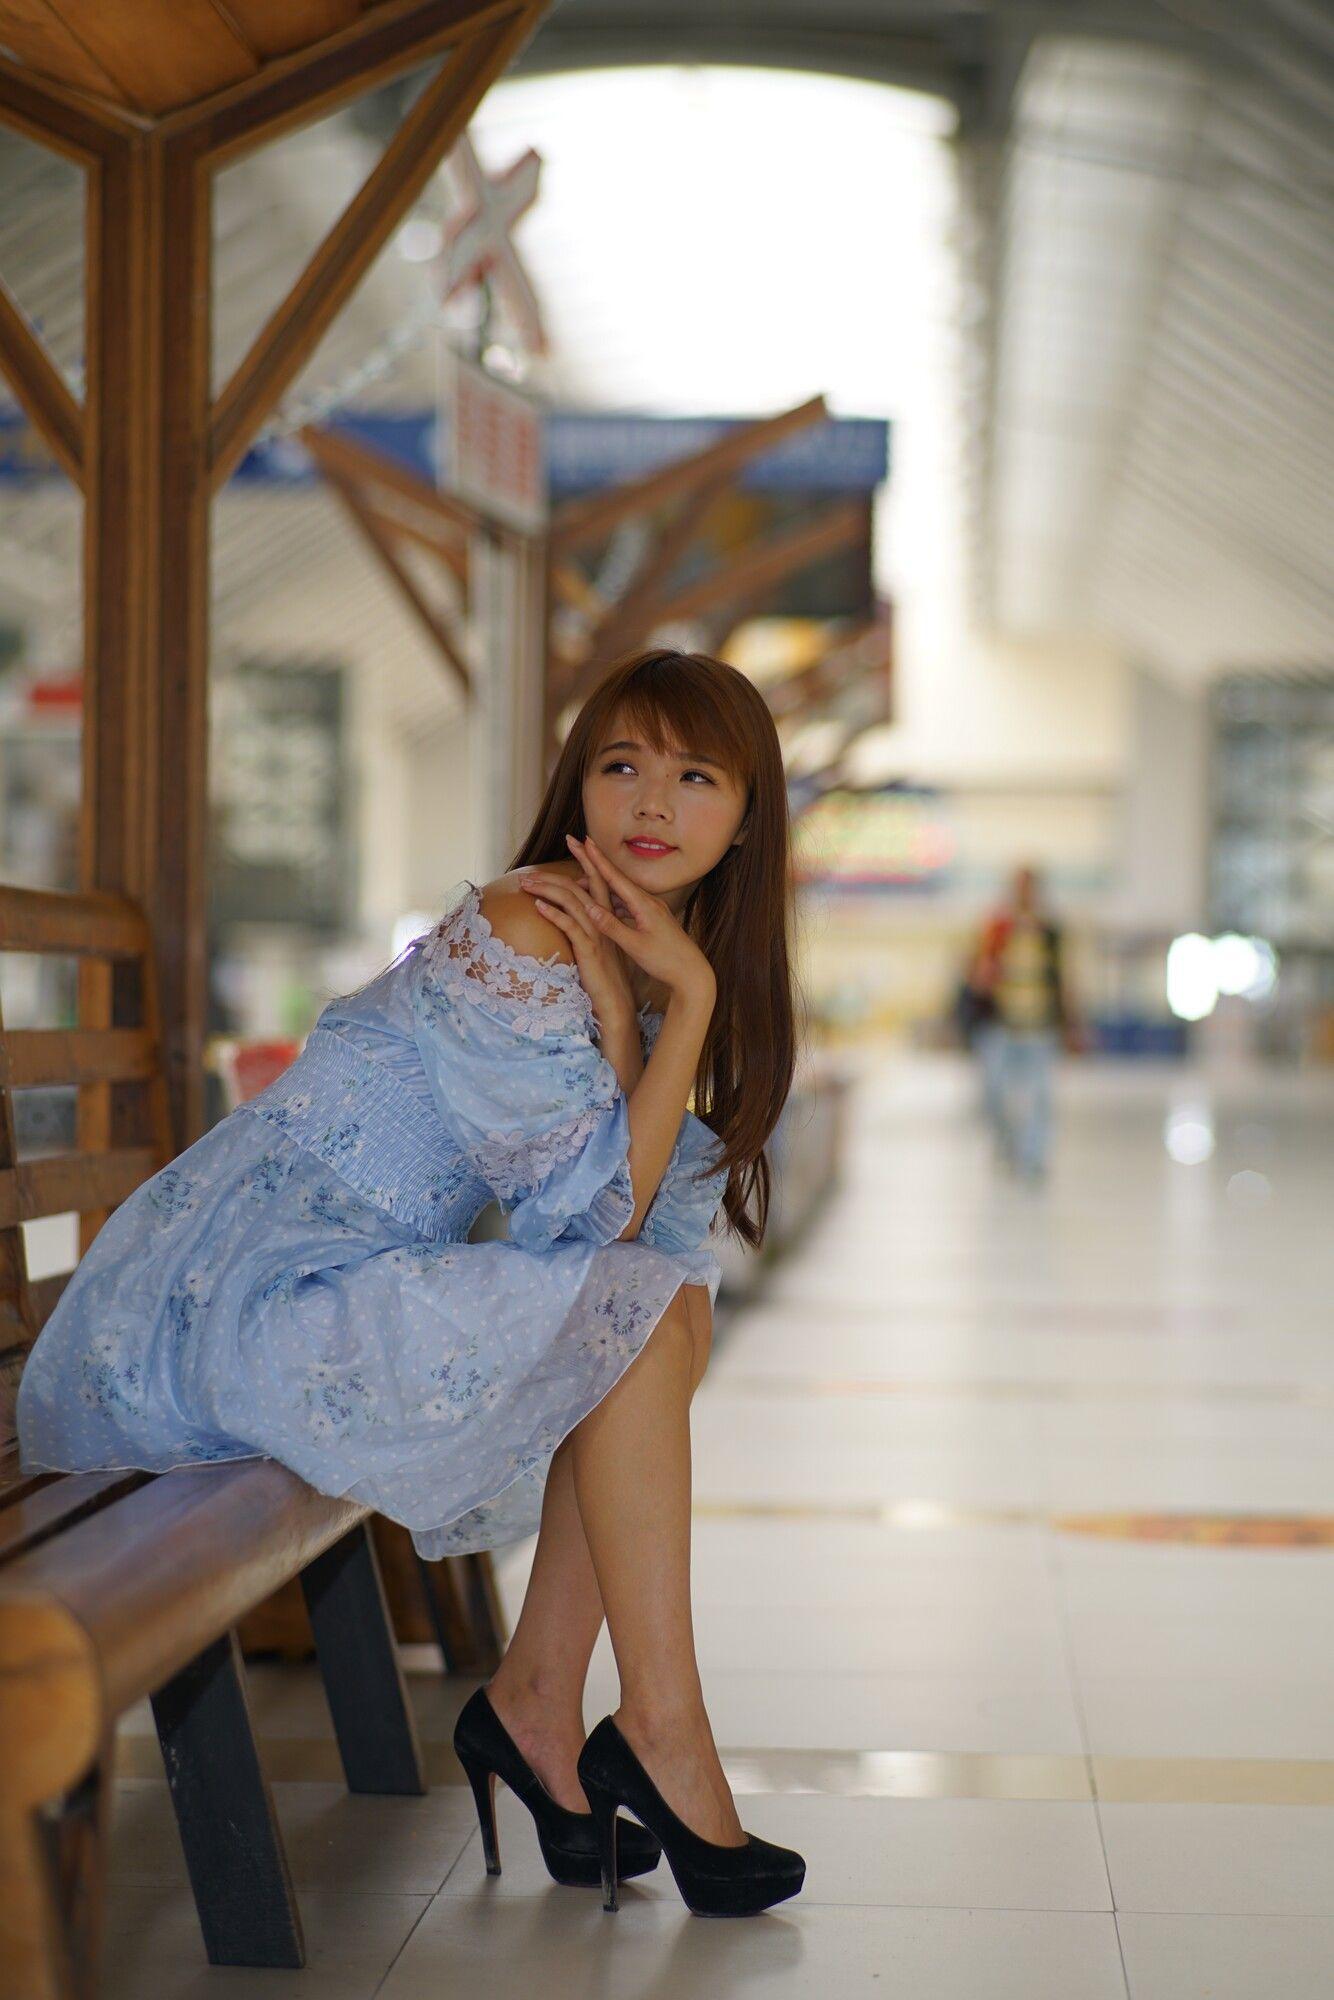 VOL.1199 [台湾正妹]甜美连衣裙软妹街拍高跟:苏郁媛超高清个人性感漂亮大图(76P)